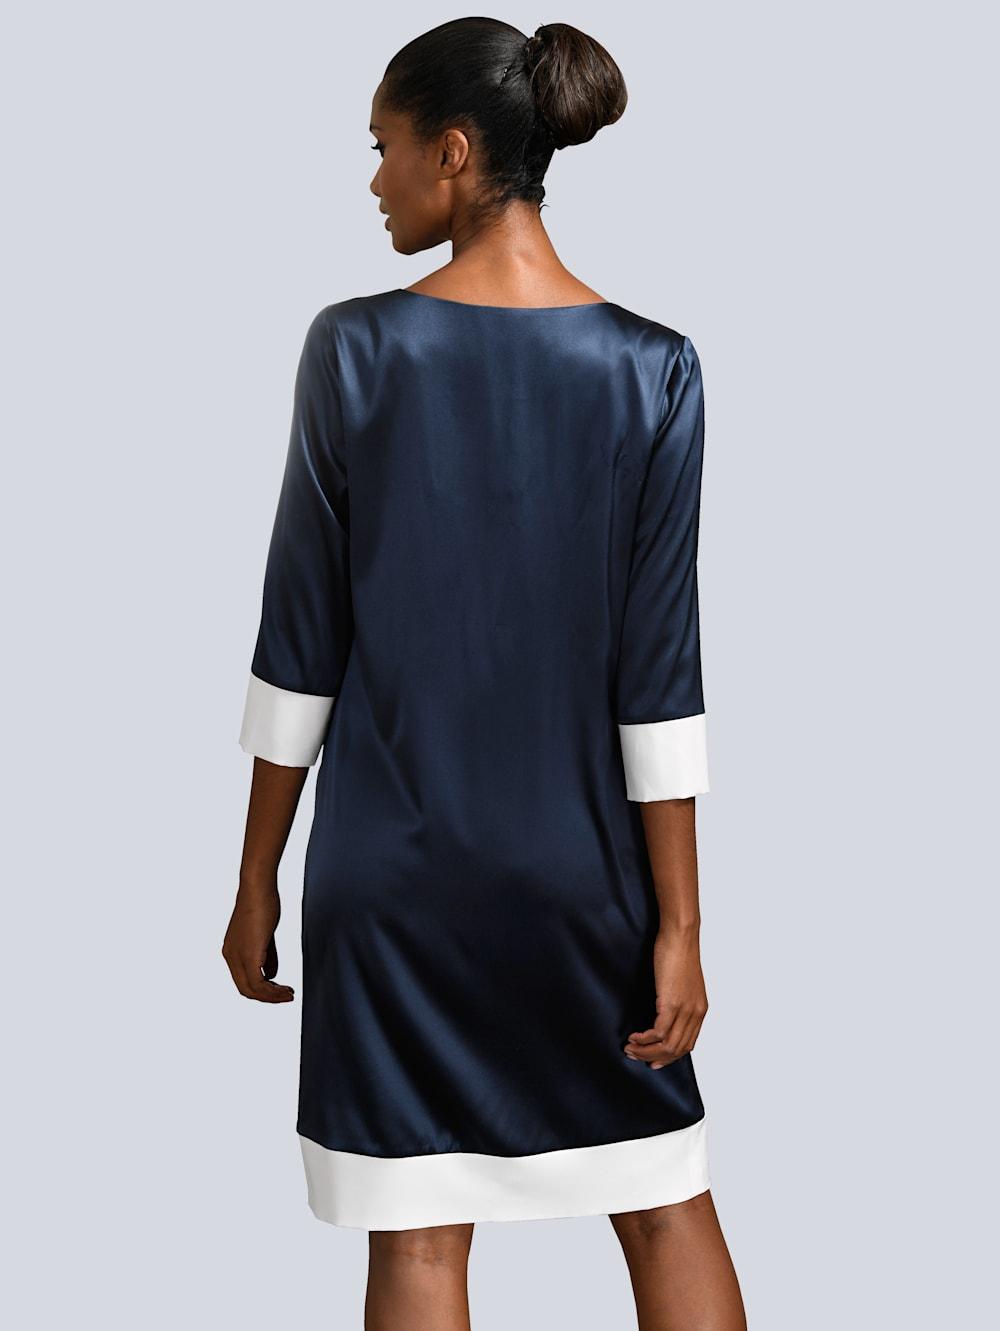 Alba Moda Kleid mit kontrastfarbenen Blenden  Alba Moda